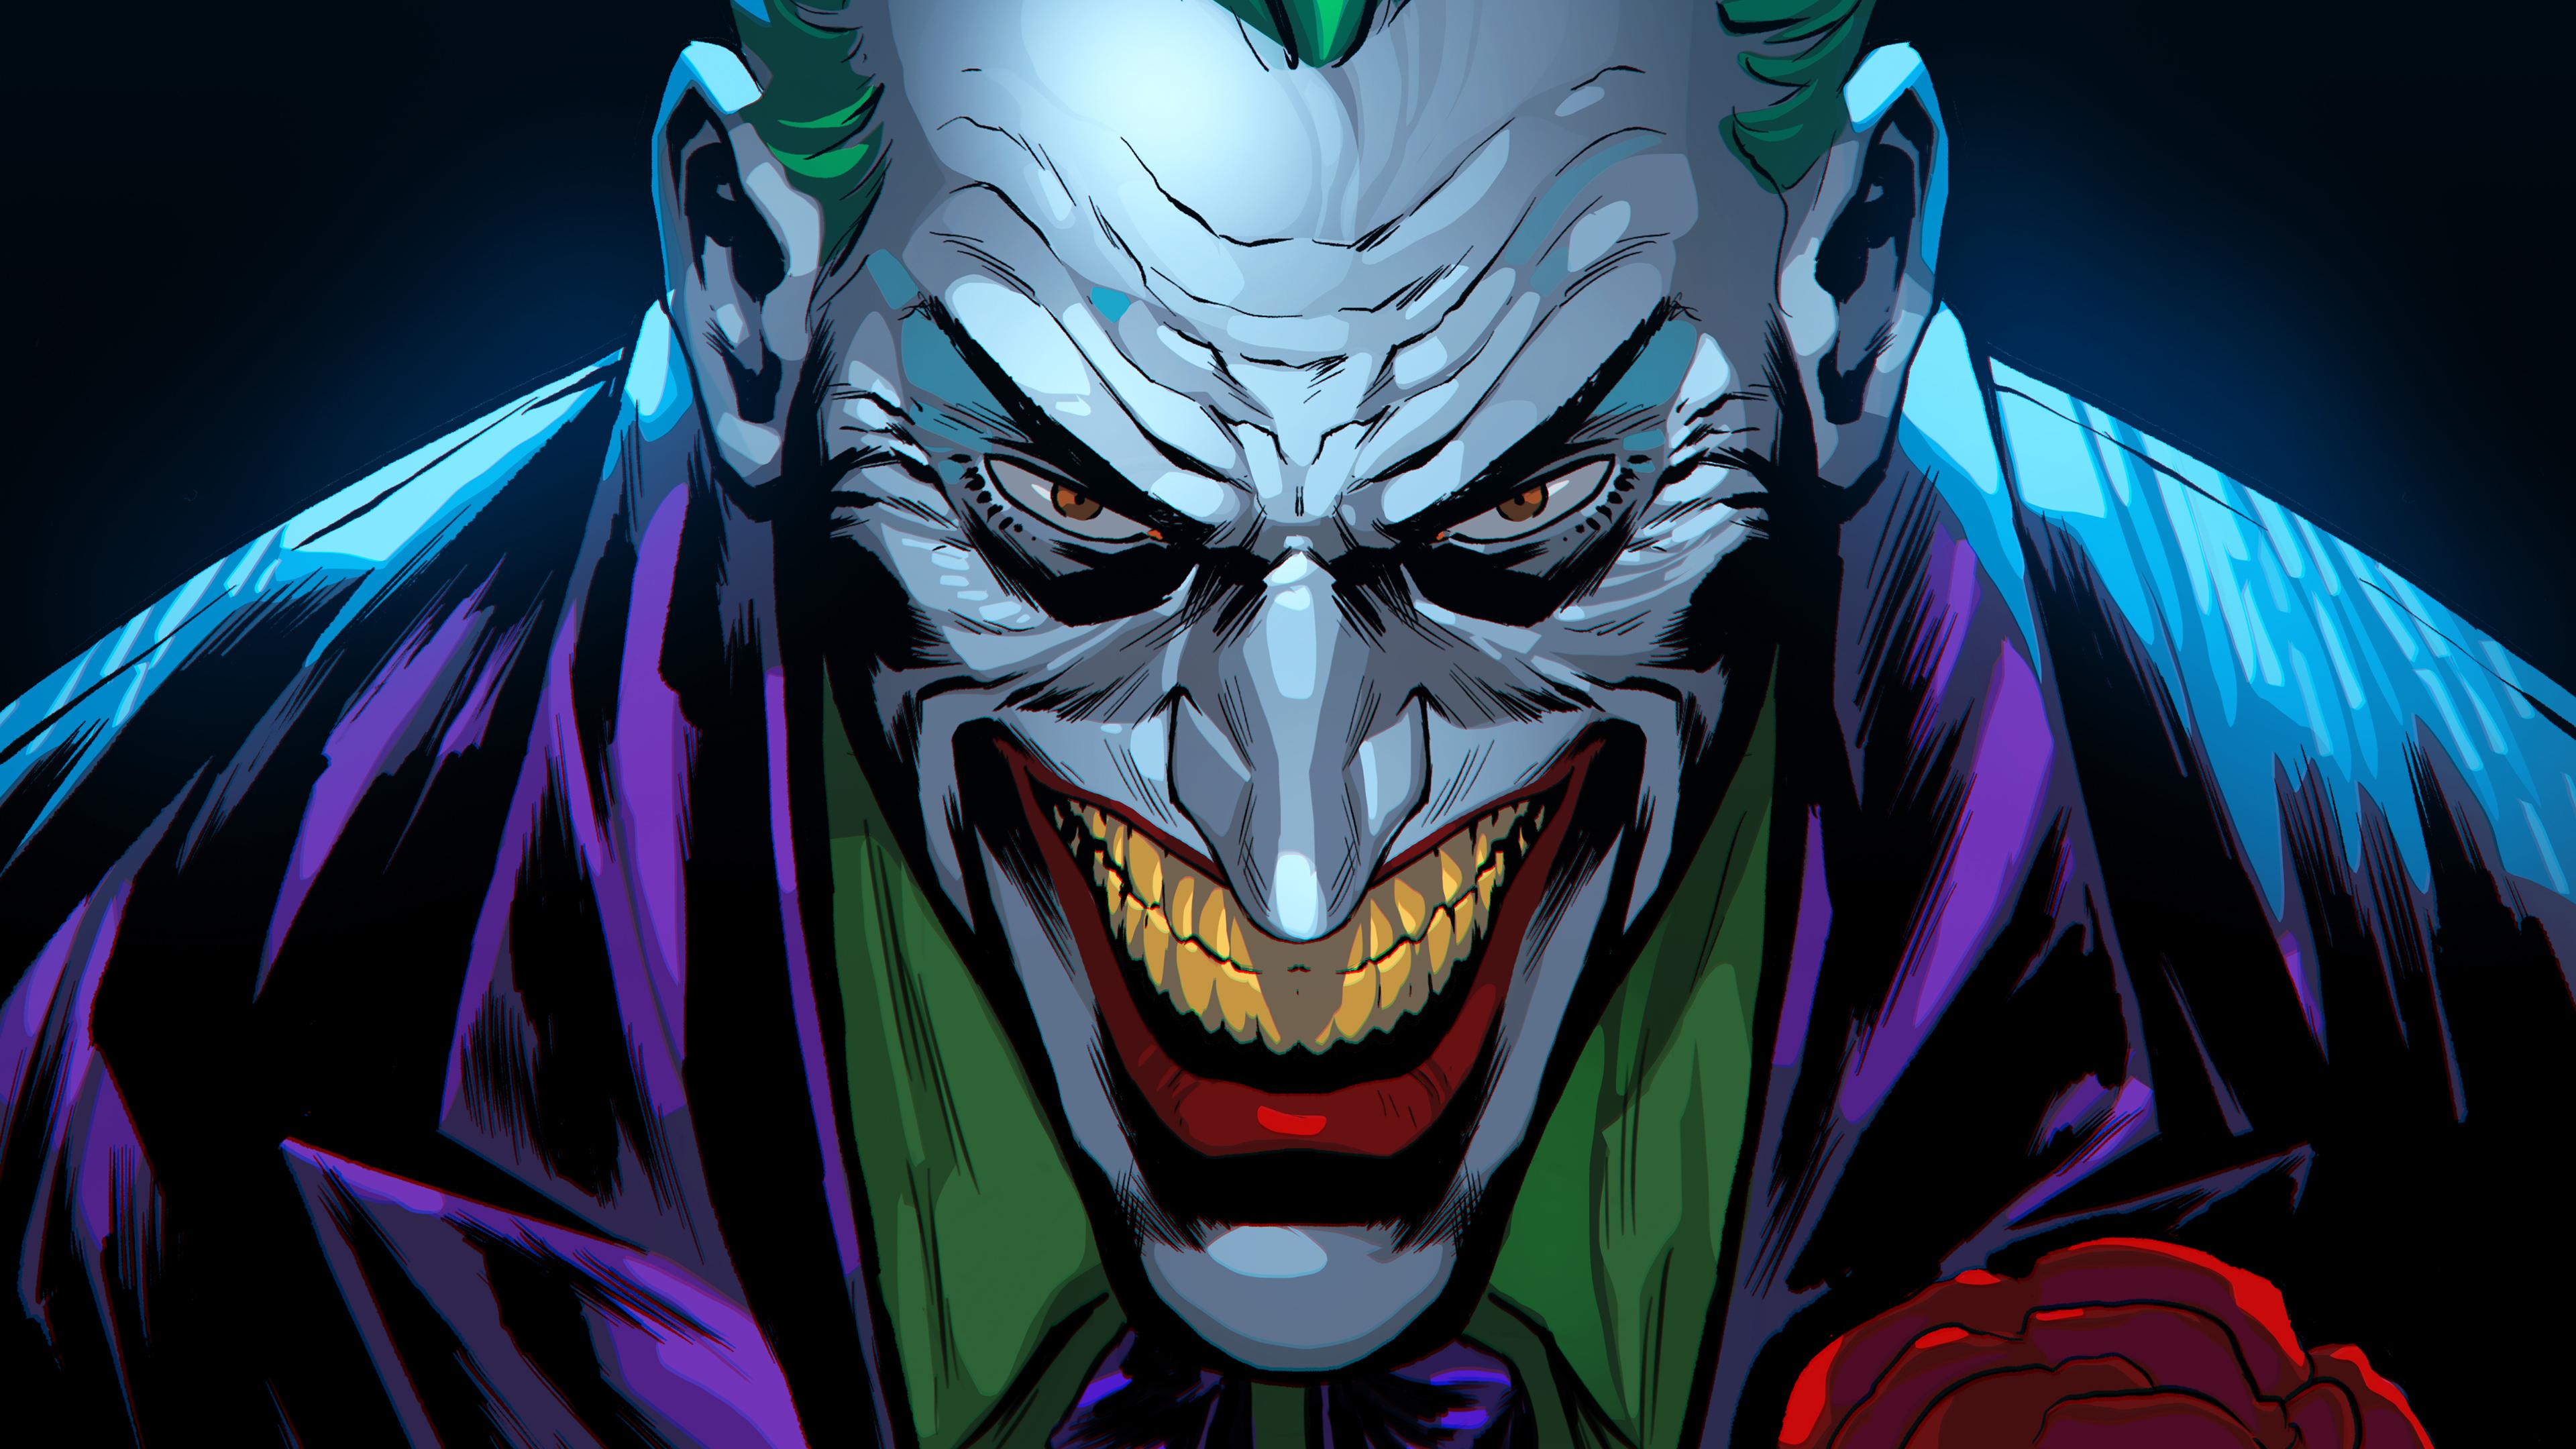 Wallpaper Joker Posted By Samantha Thompson